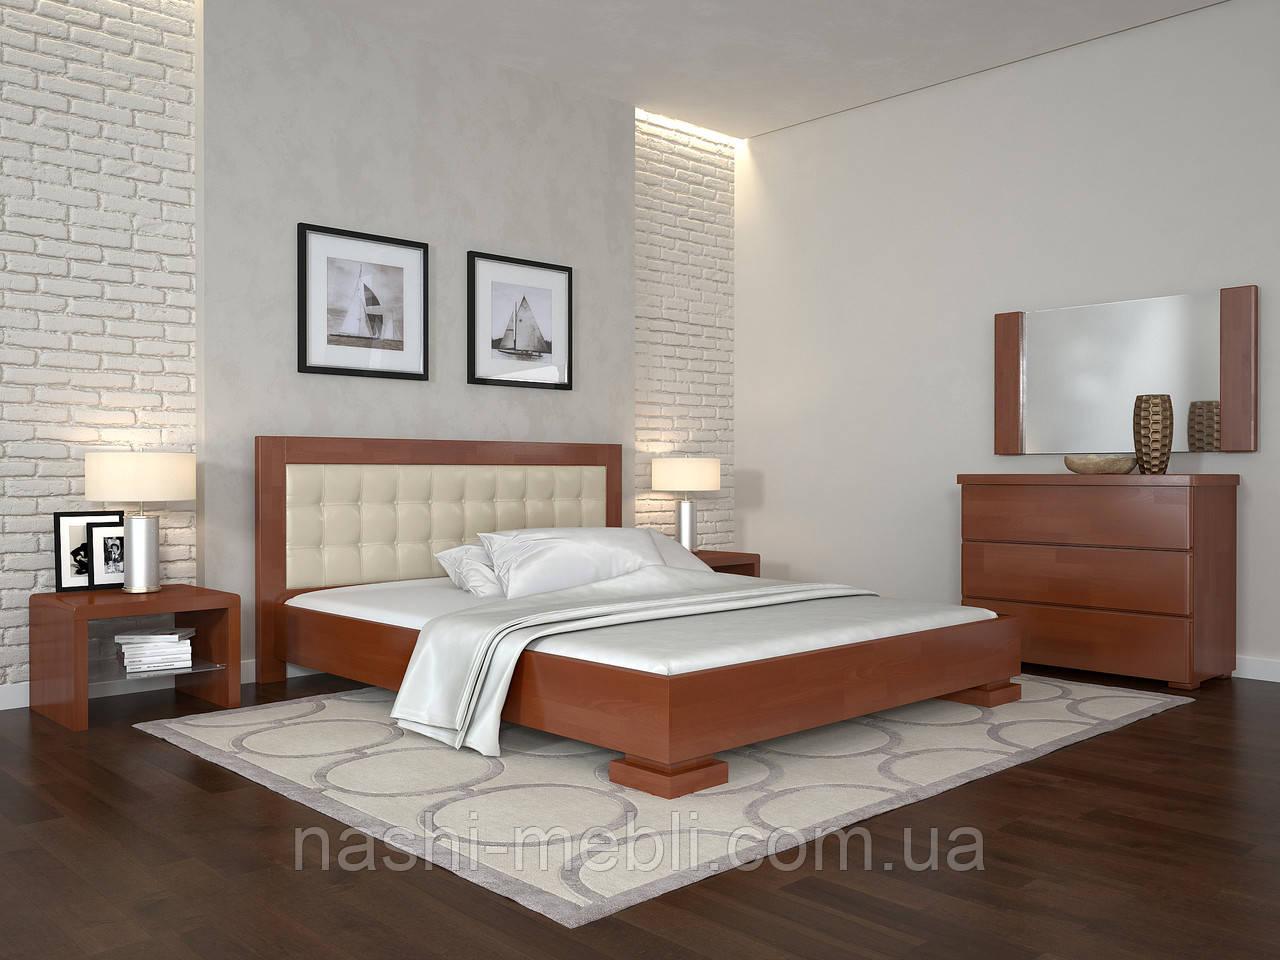 Двоспальне ліжко Монако